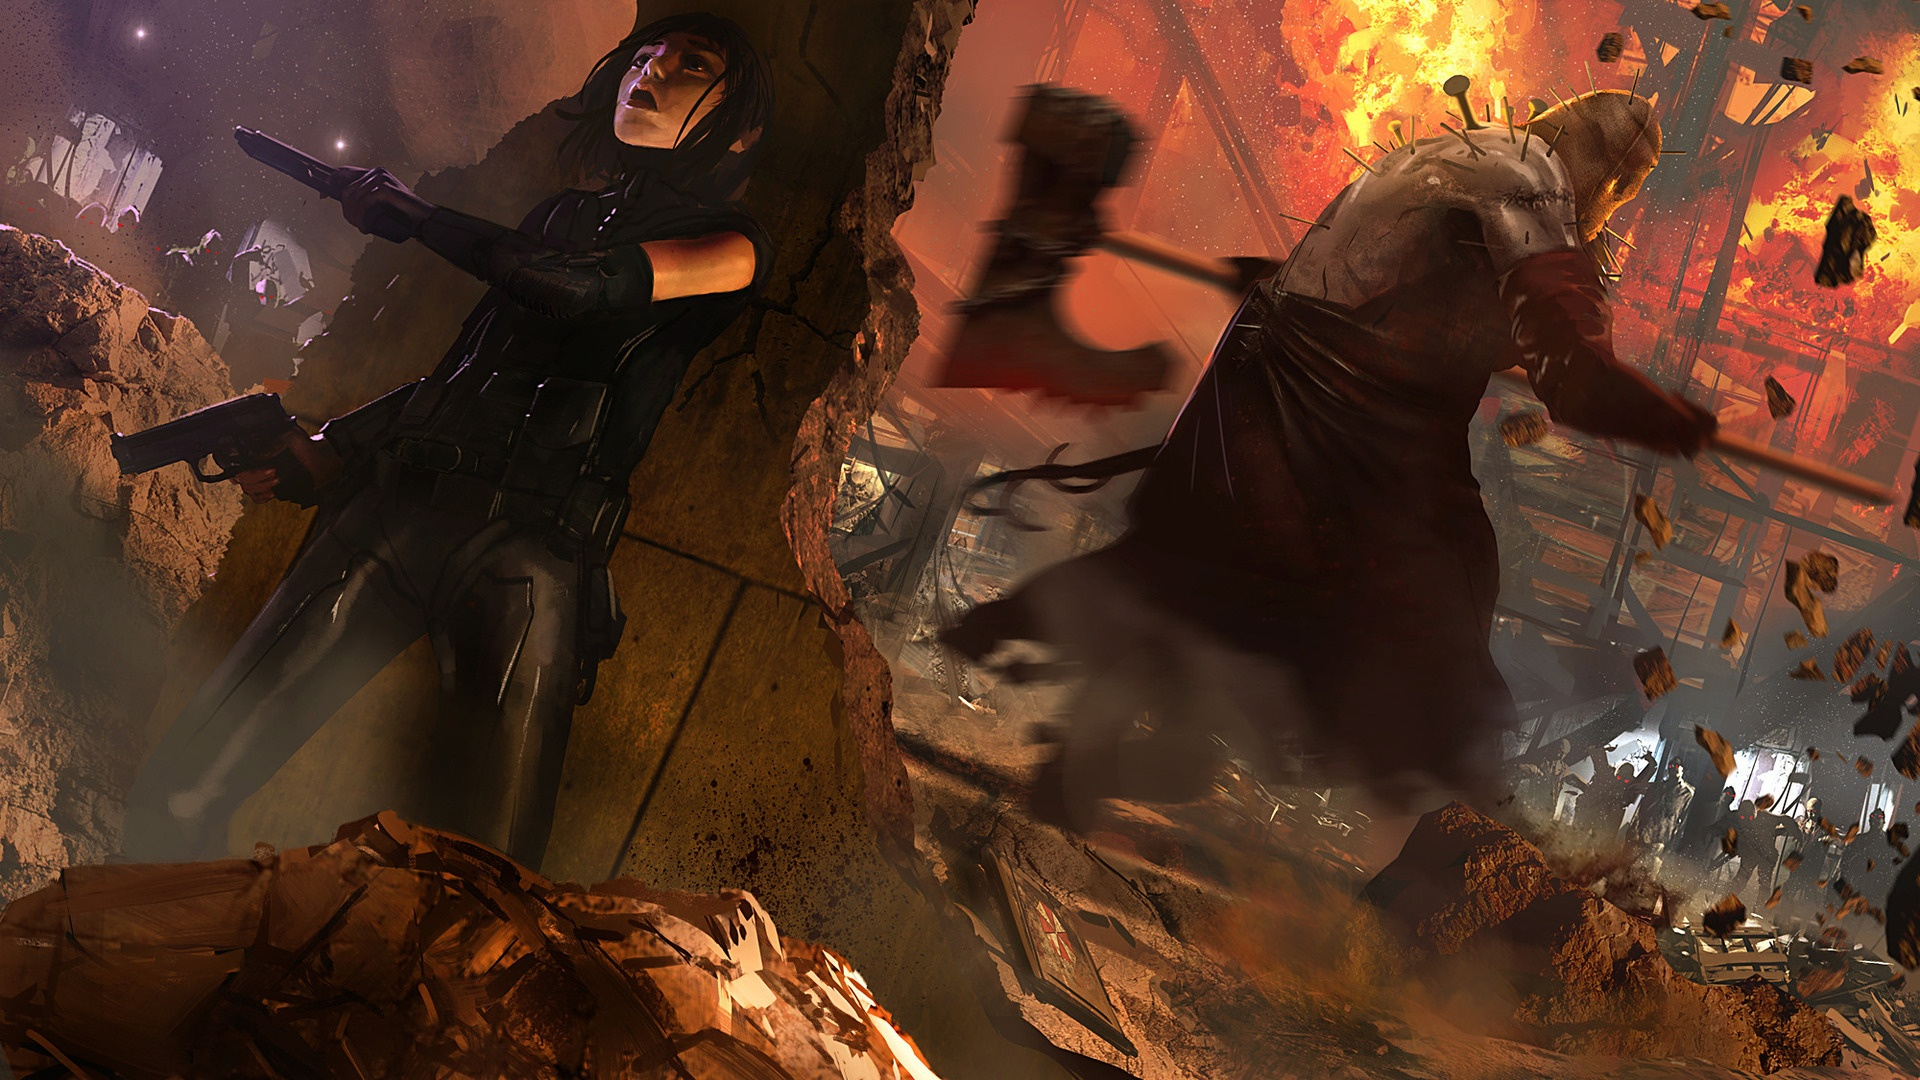 Resident evil 5 gold edition hd wallpaper background - Wallpaper resident evil 5 ...